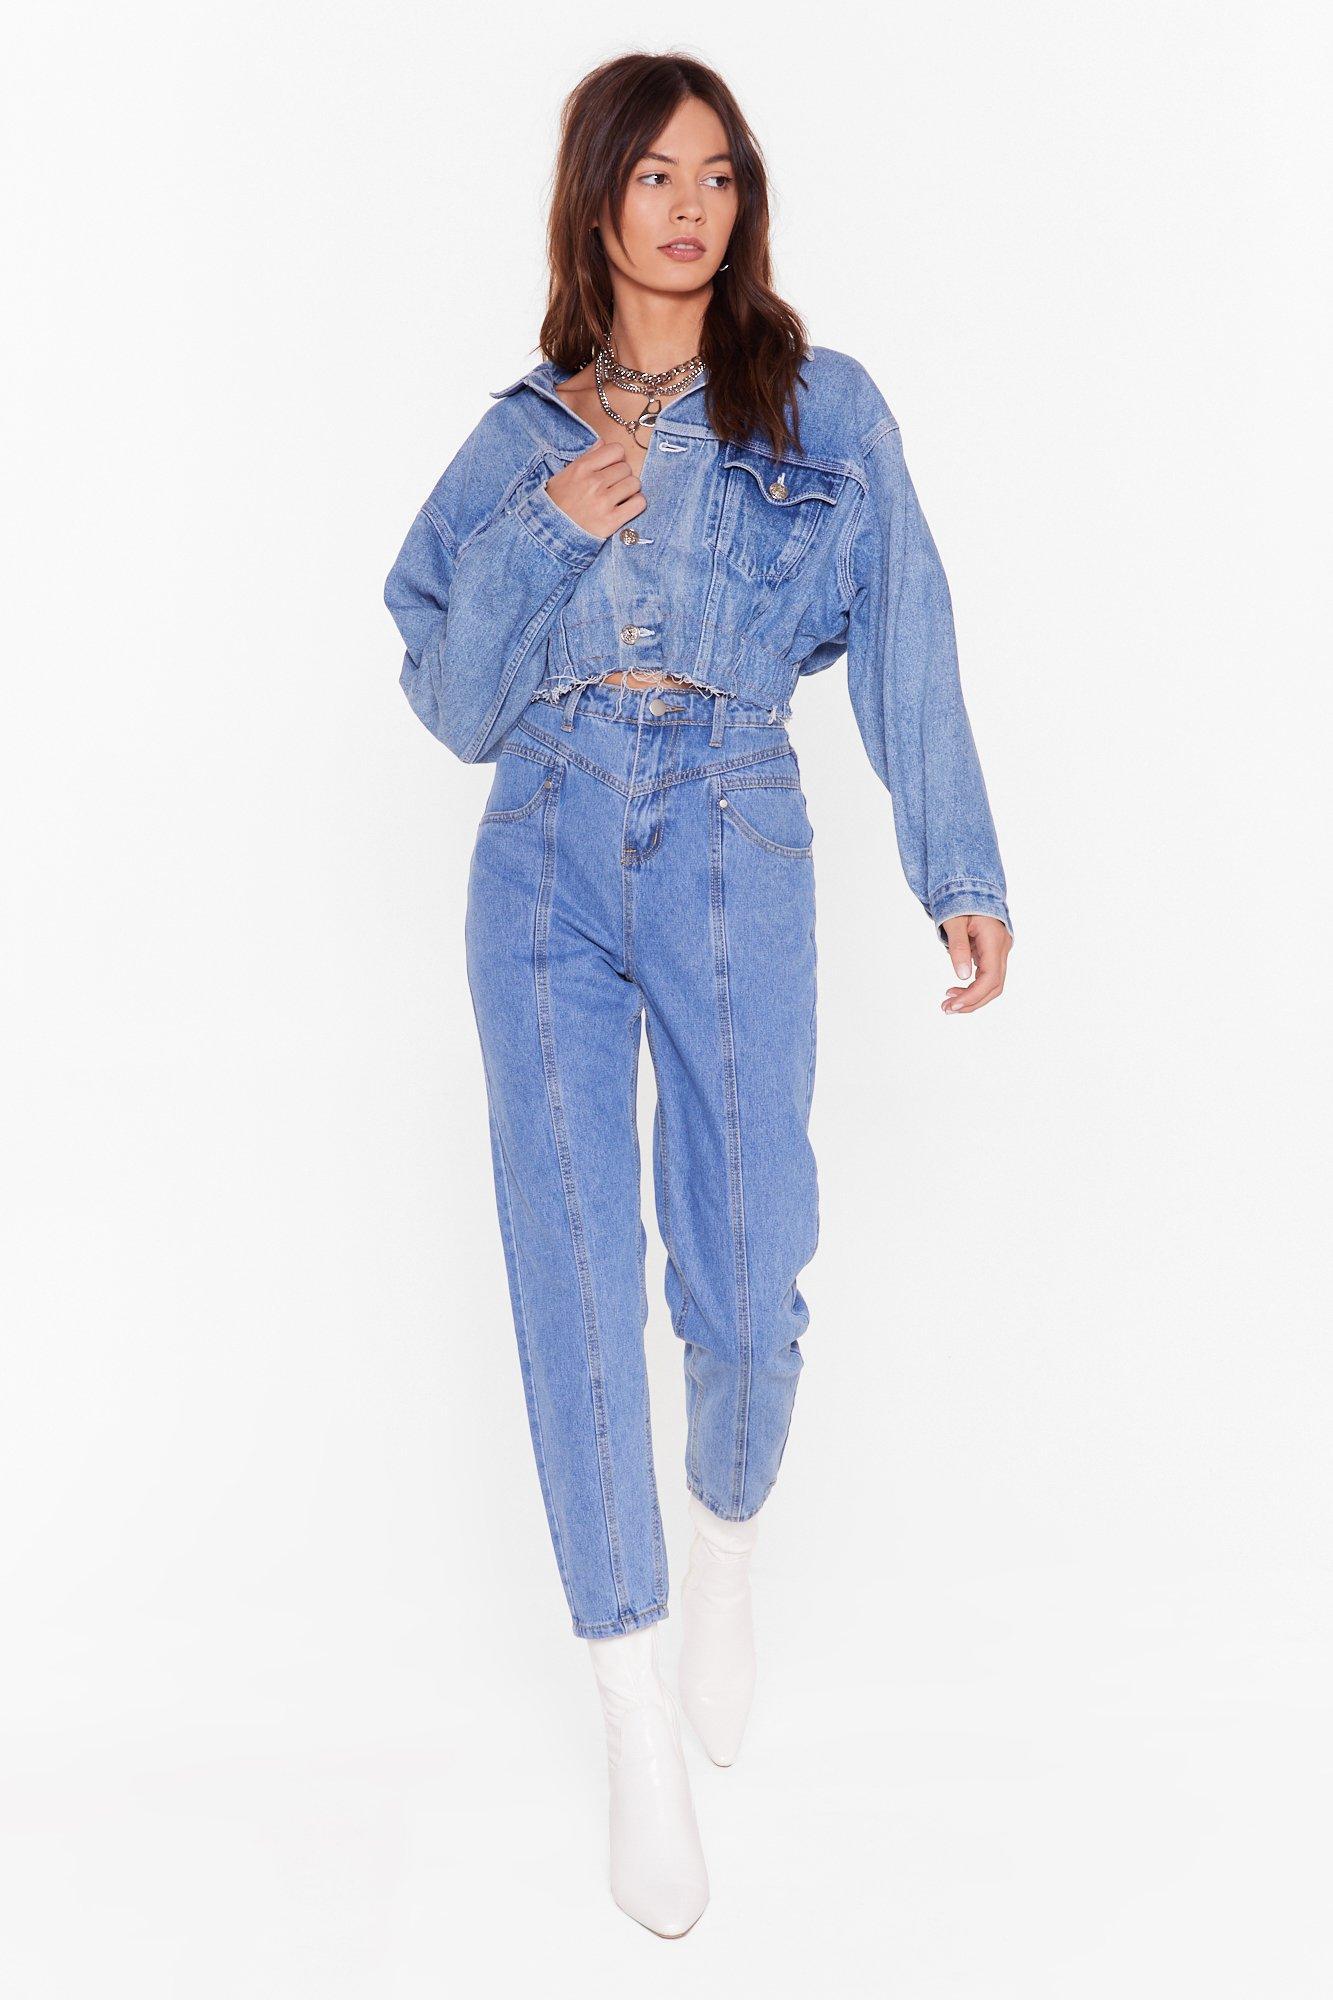 Image of Seams Like a Good Idea Denim Mom Jeans